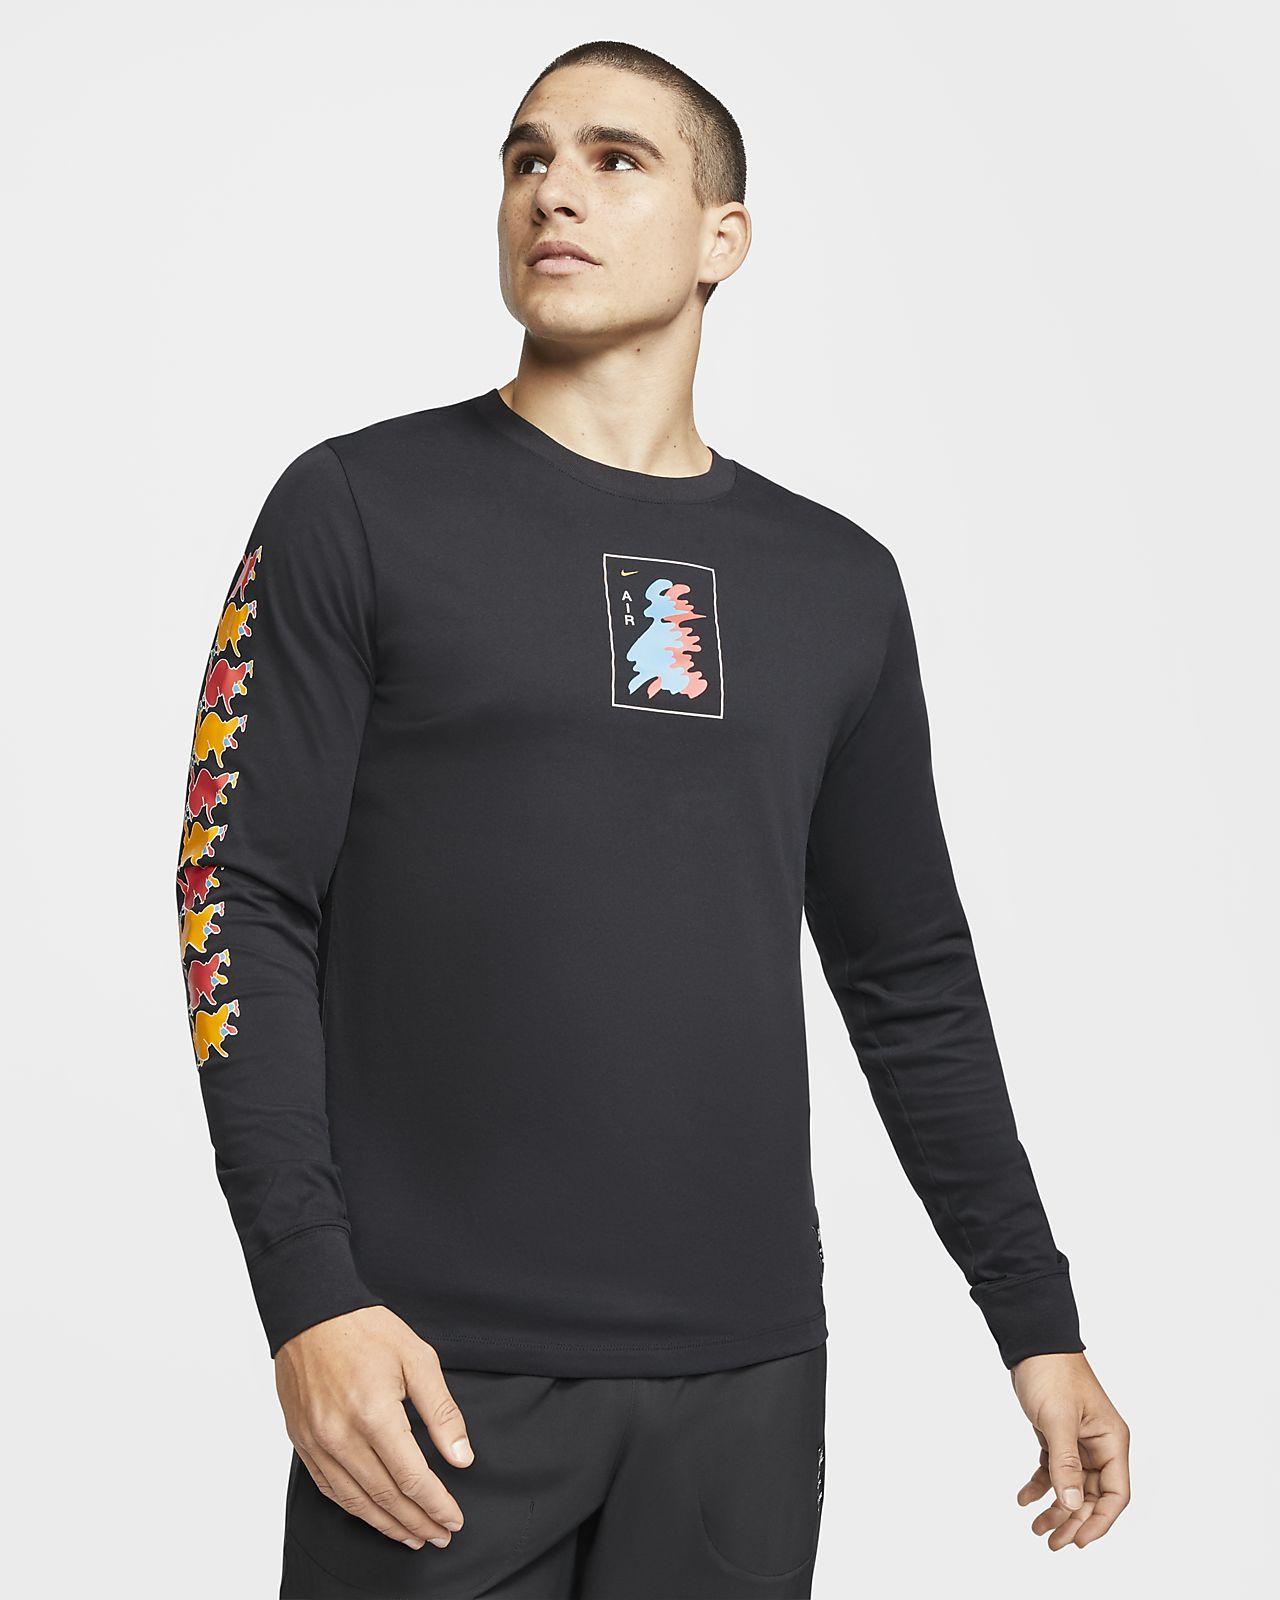 Nike Dri-FIT A.I.R. Men's Long-Sleeve Running T-Shirt